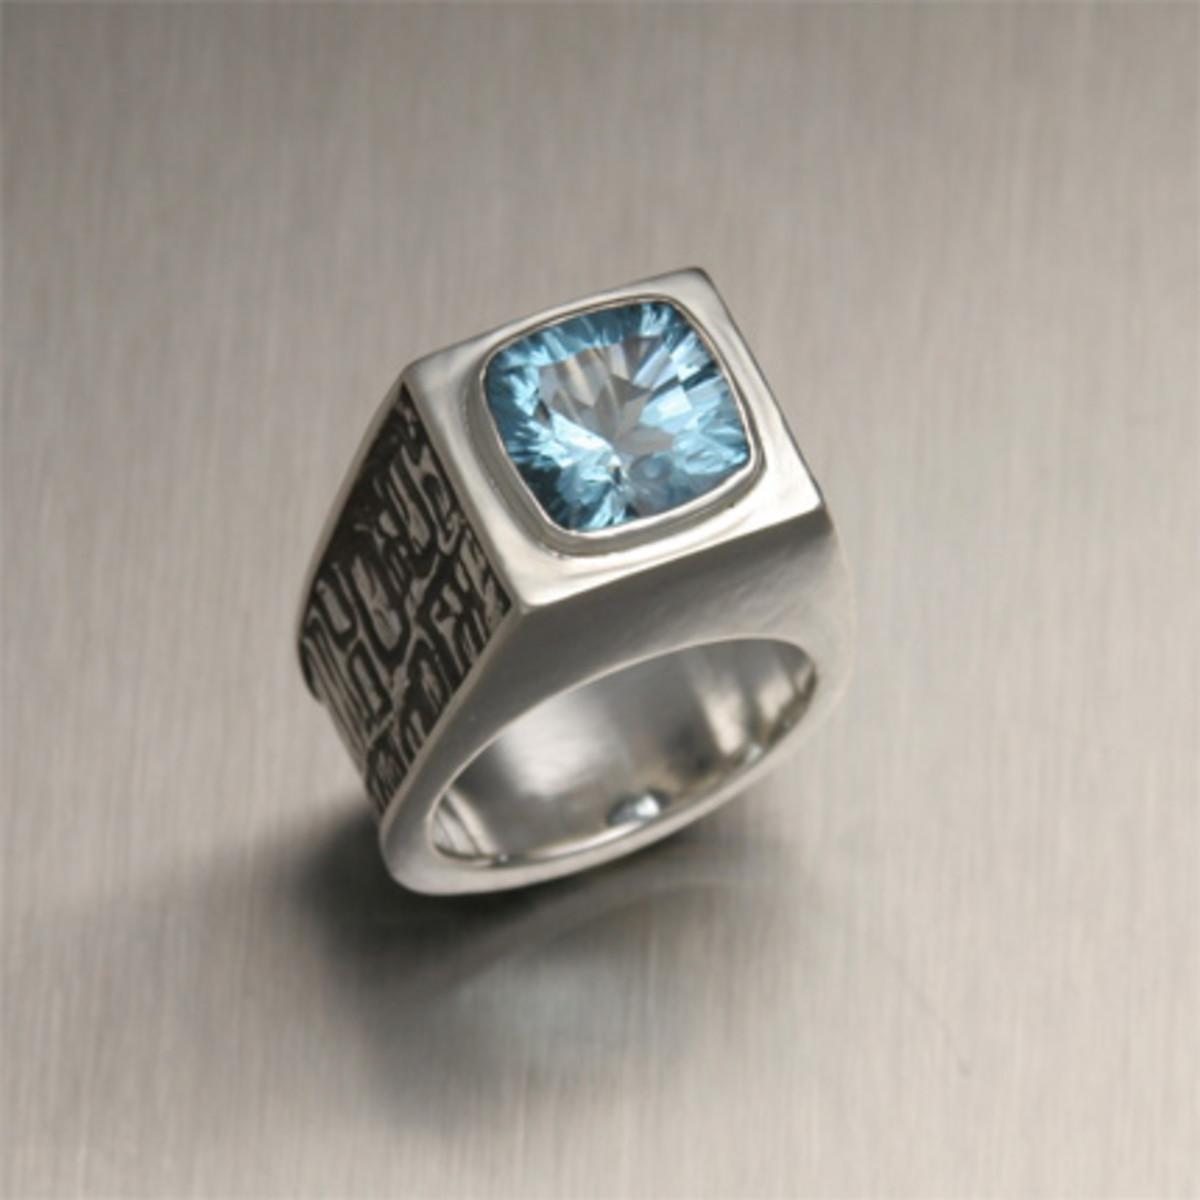 Blue Topaz Hand Fabricated Men's Ring